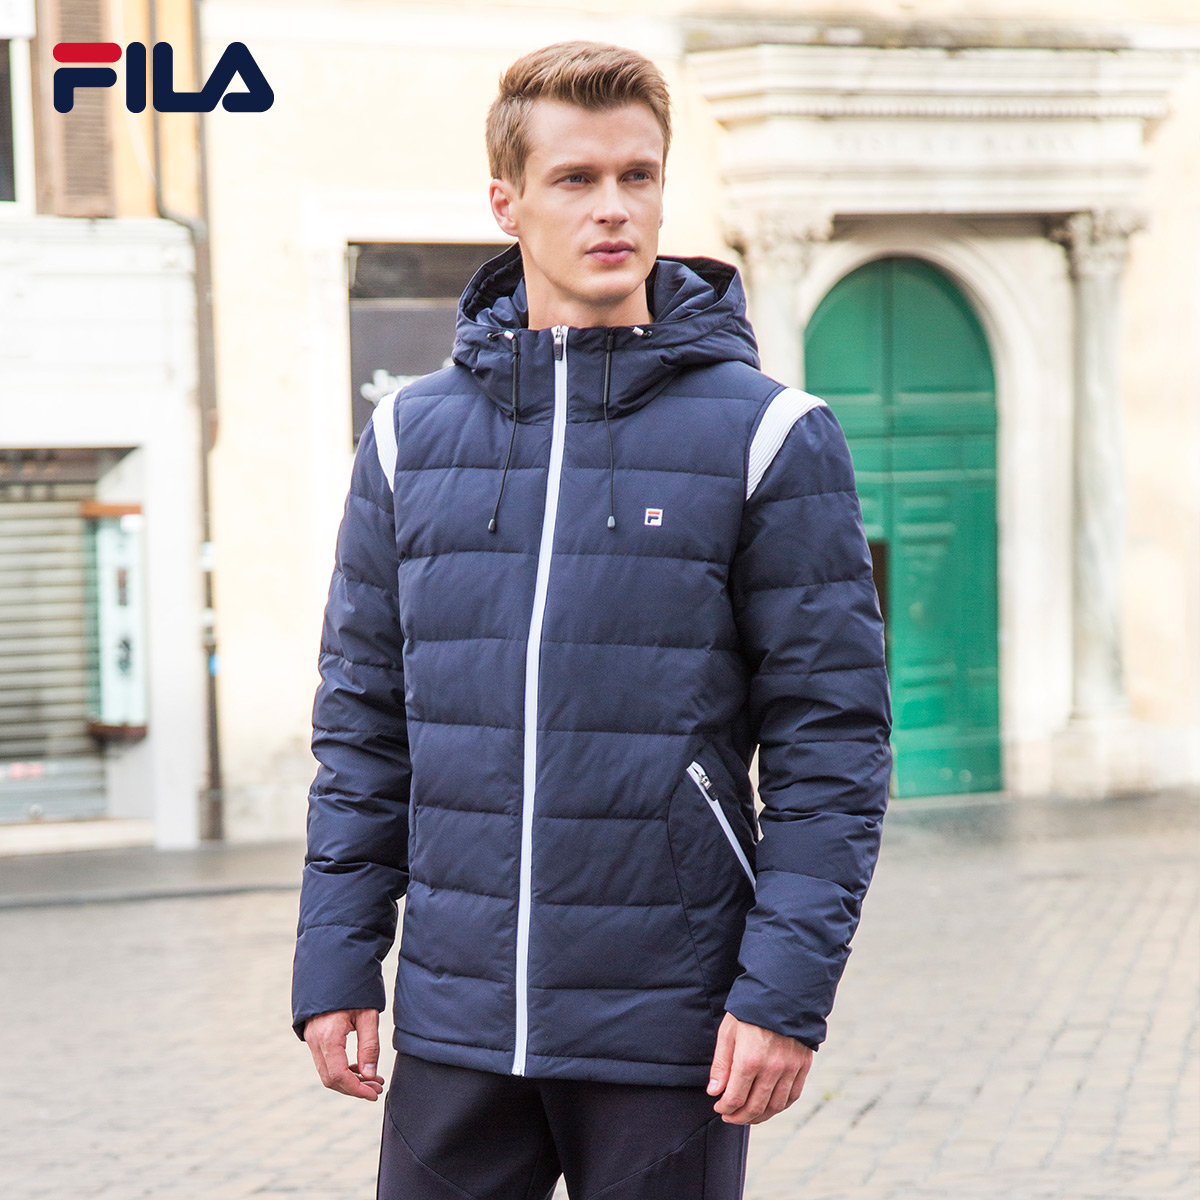 9286acc3b30c FILA Feile men s down jacket winter new warm sports and leisure wind hooded sports  Down Jacket Men